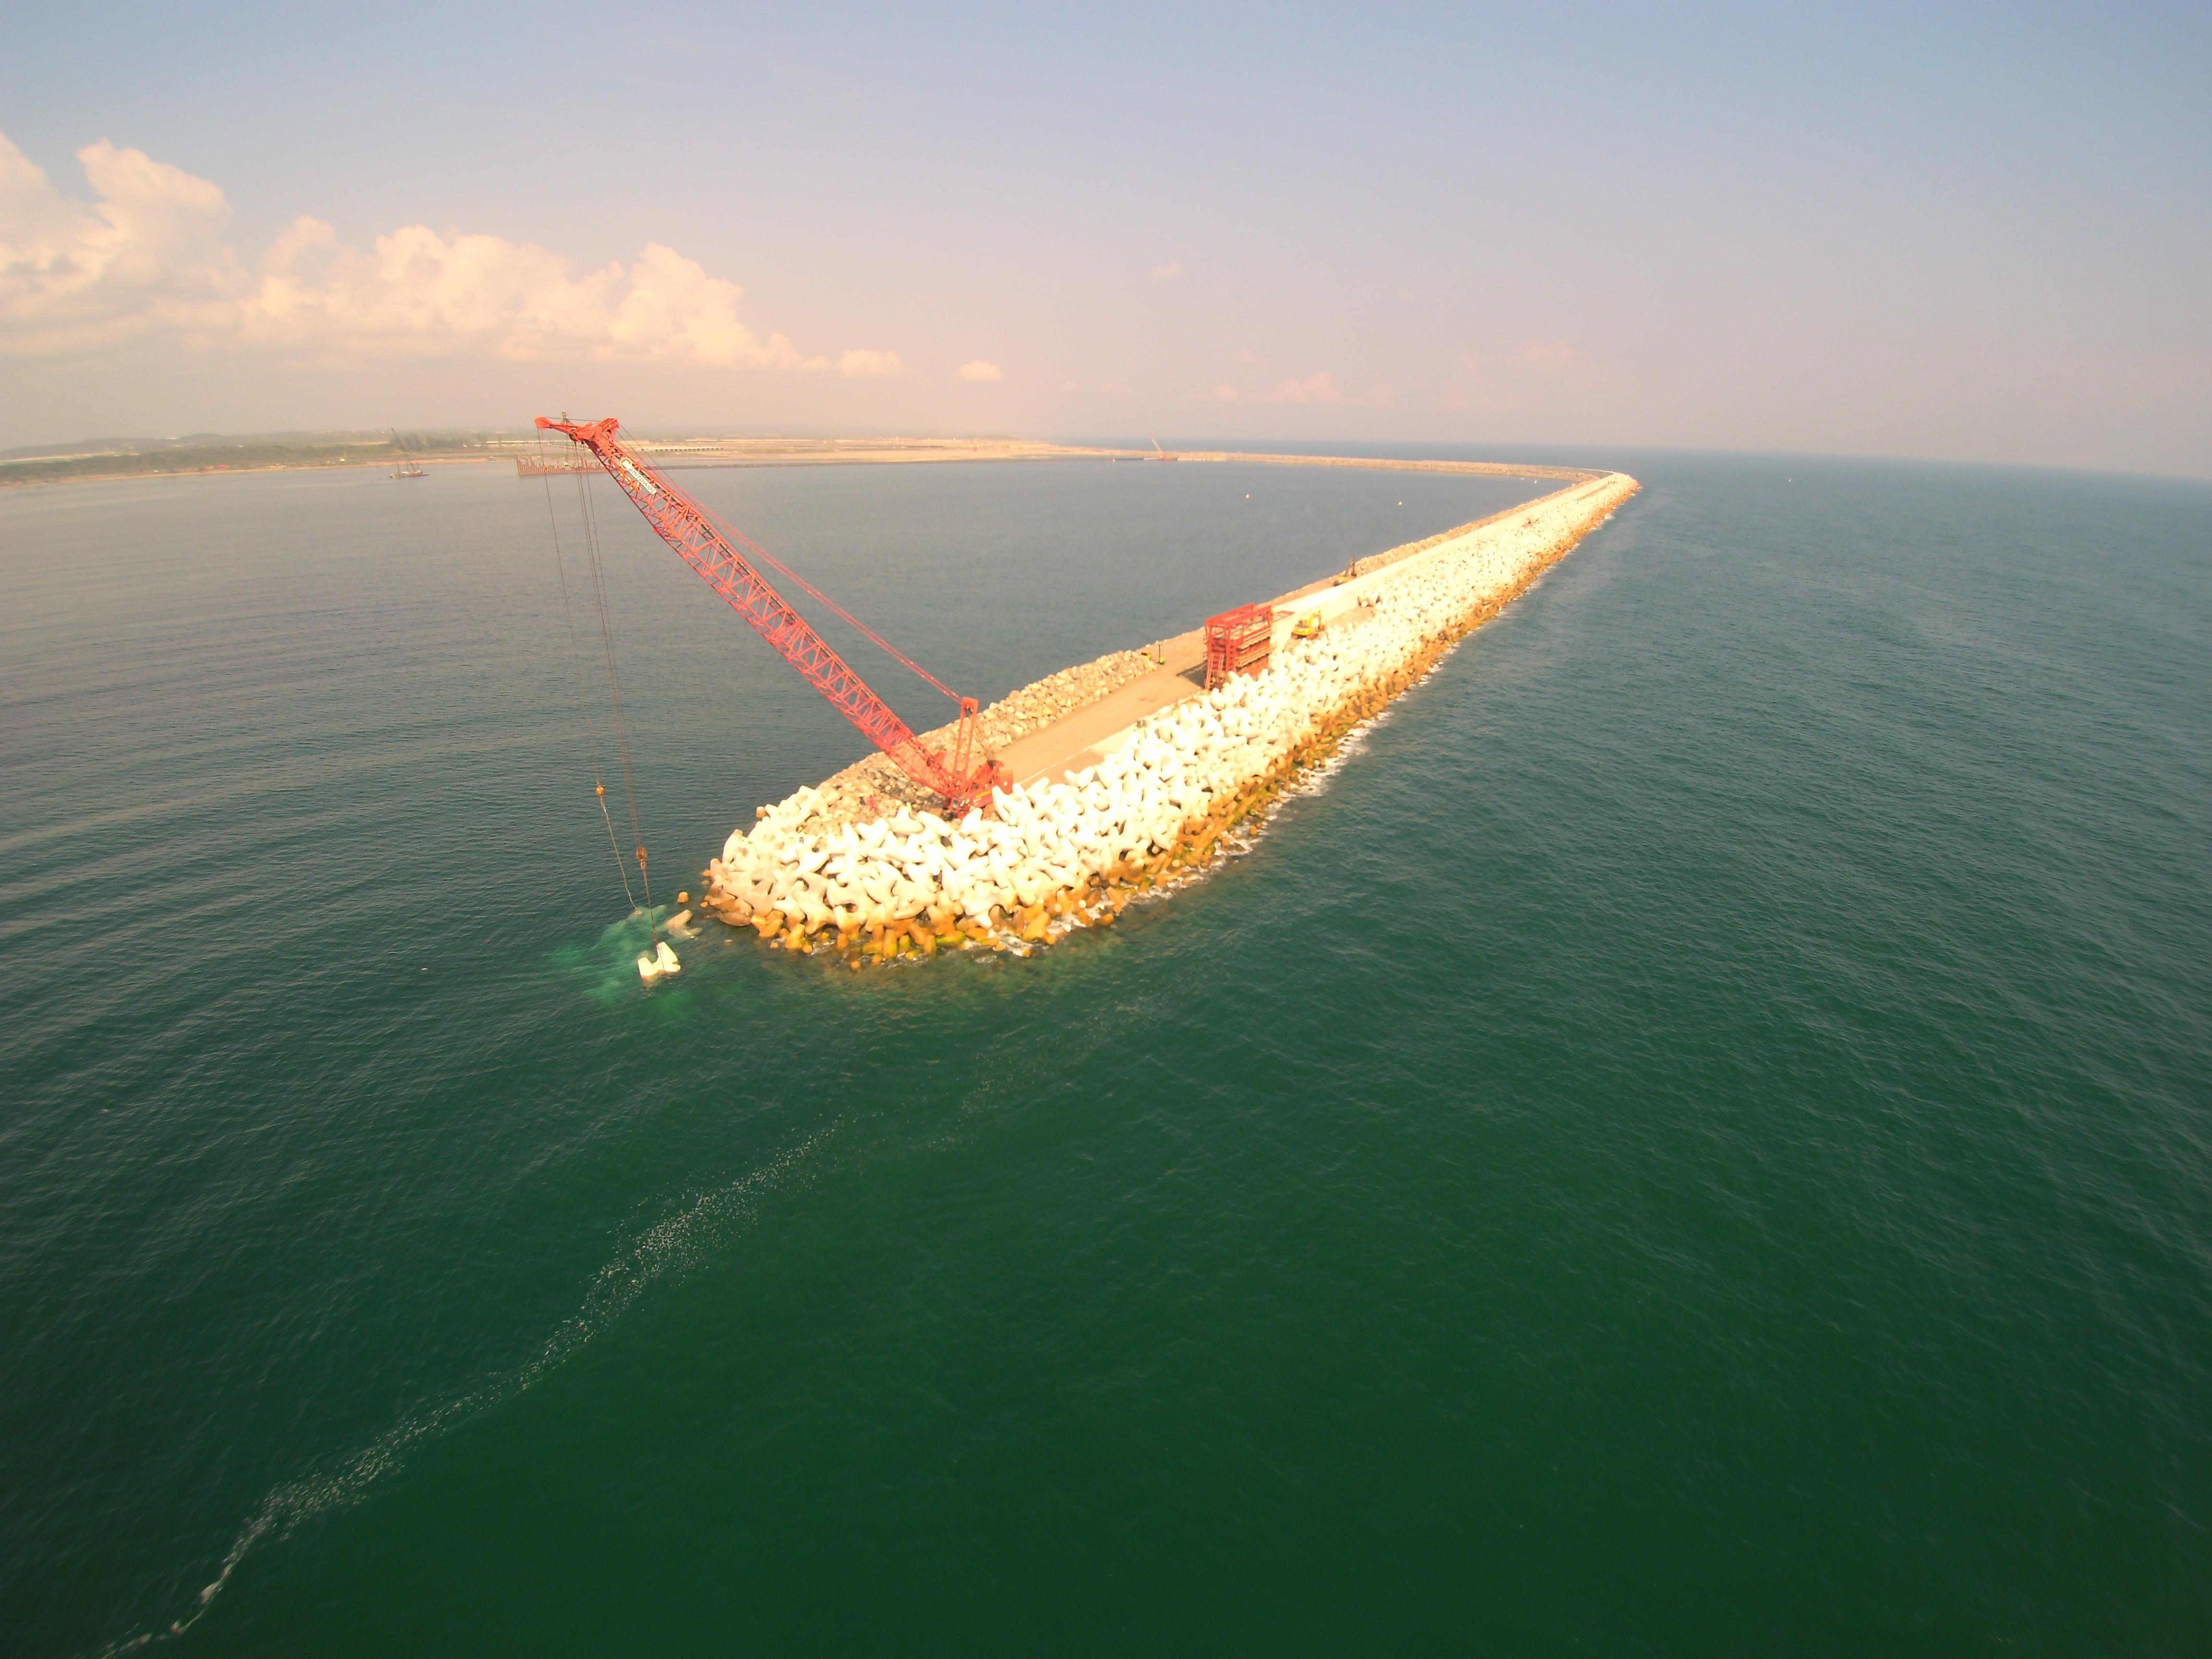 Puerto de Veracruz, México